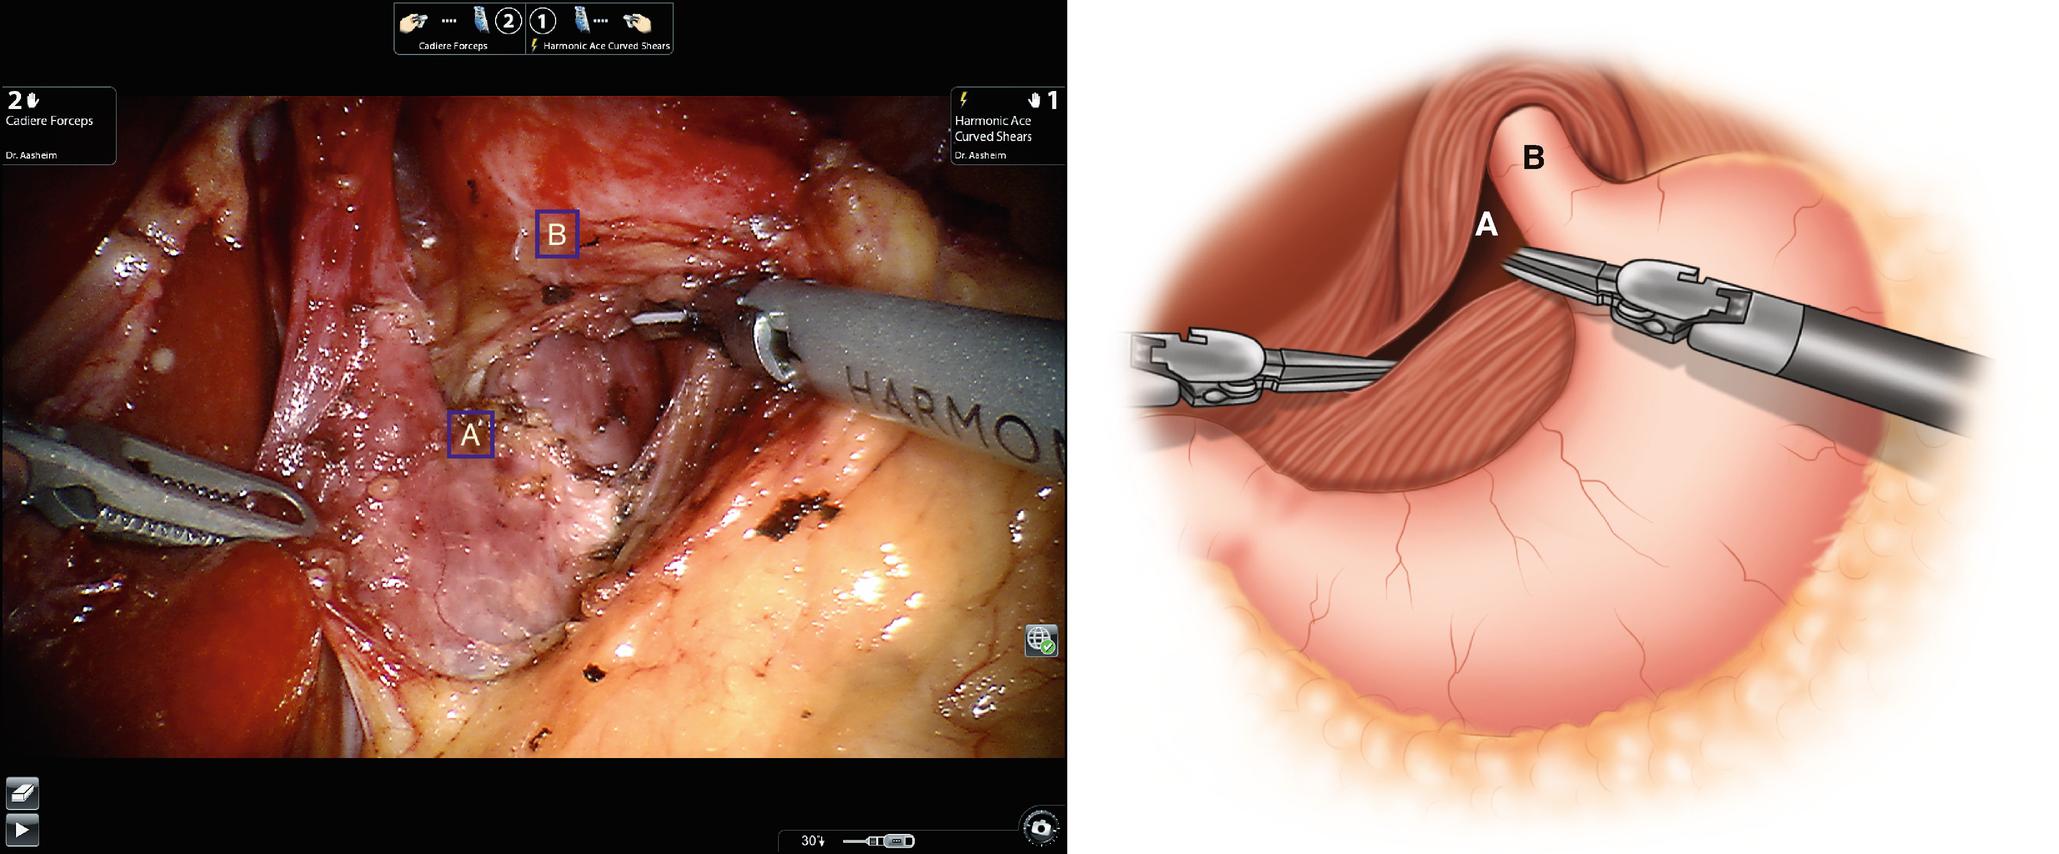 Robotic Operations for Gastroesophageal Reflux Disease | SpringerLink